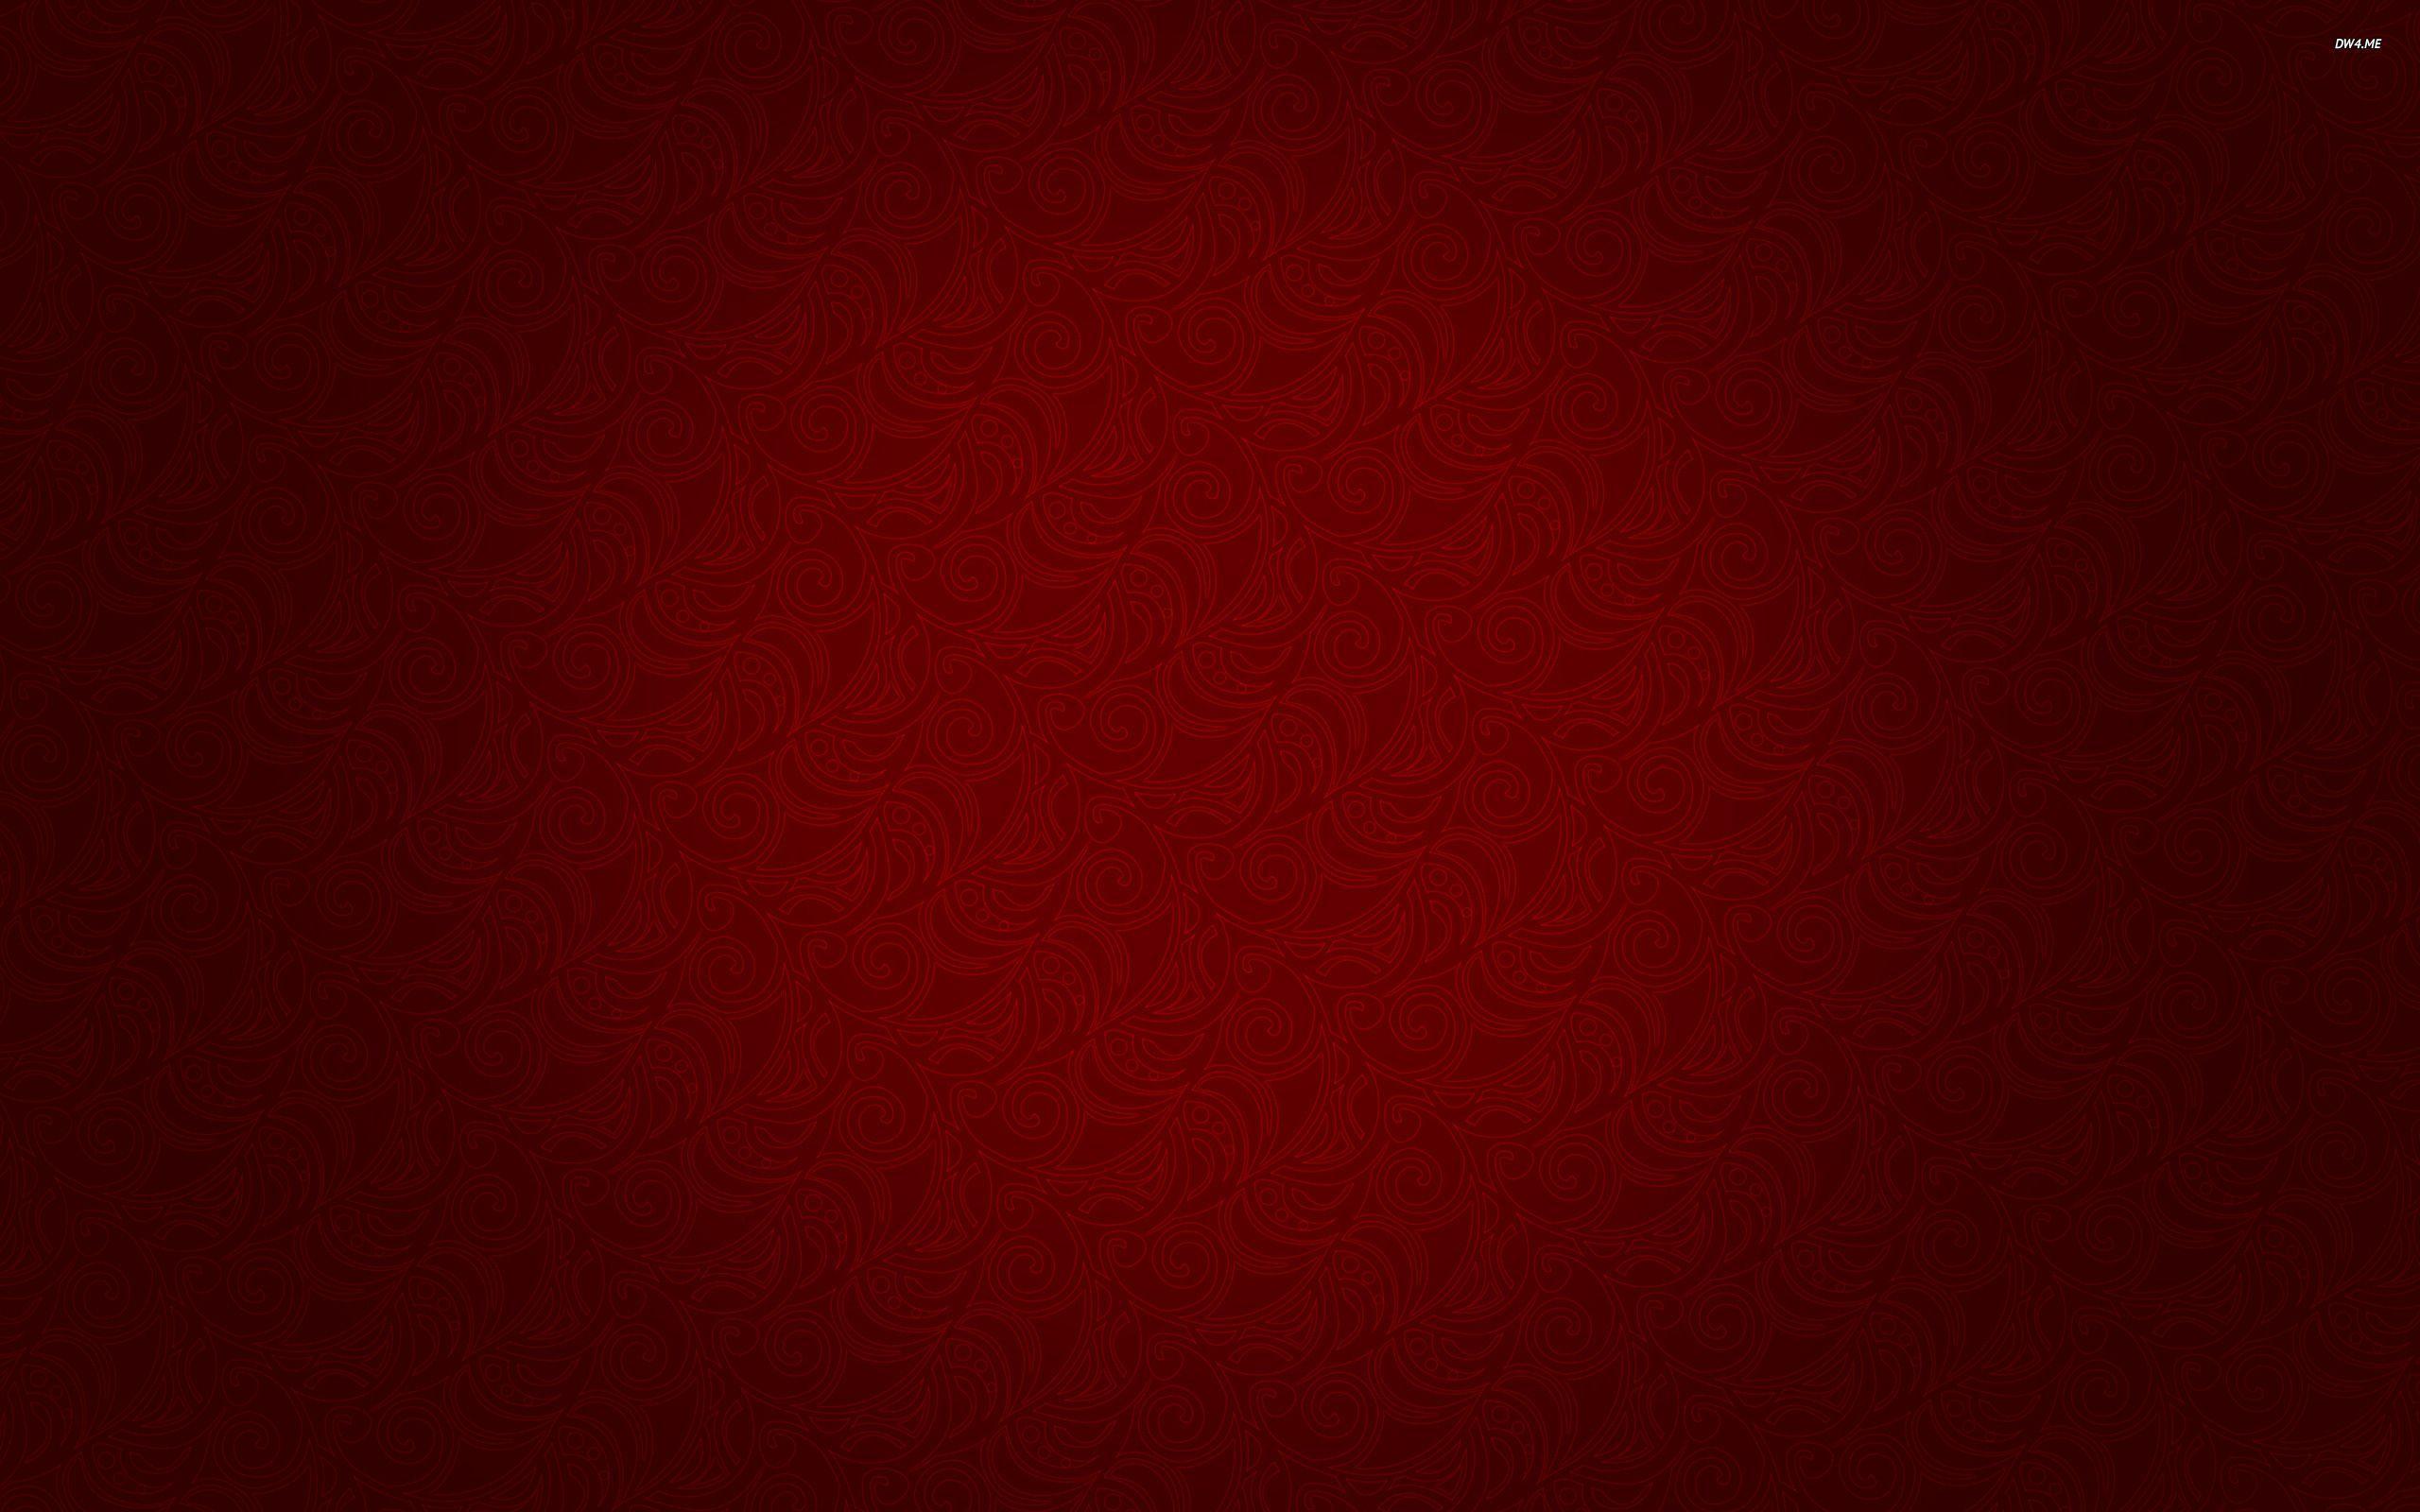 car wallpaper - Awesome Red Carbon Fiber Wallpaper Hd